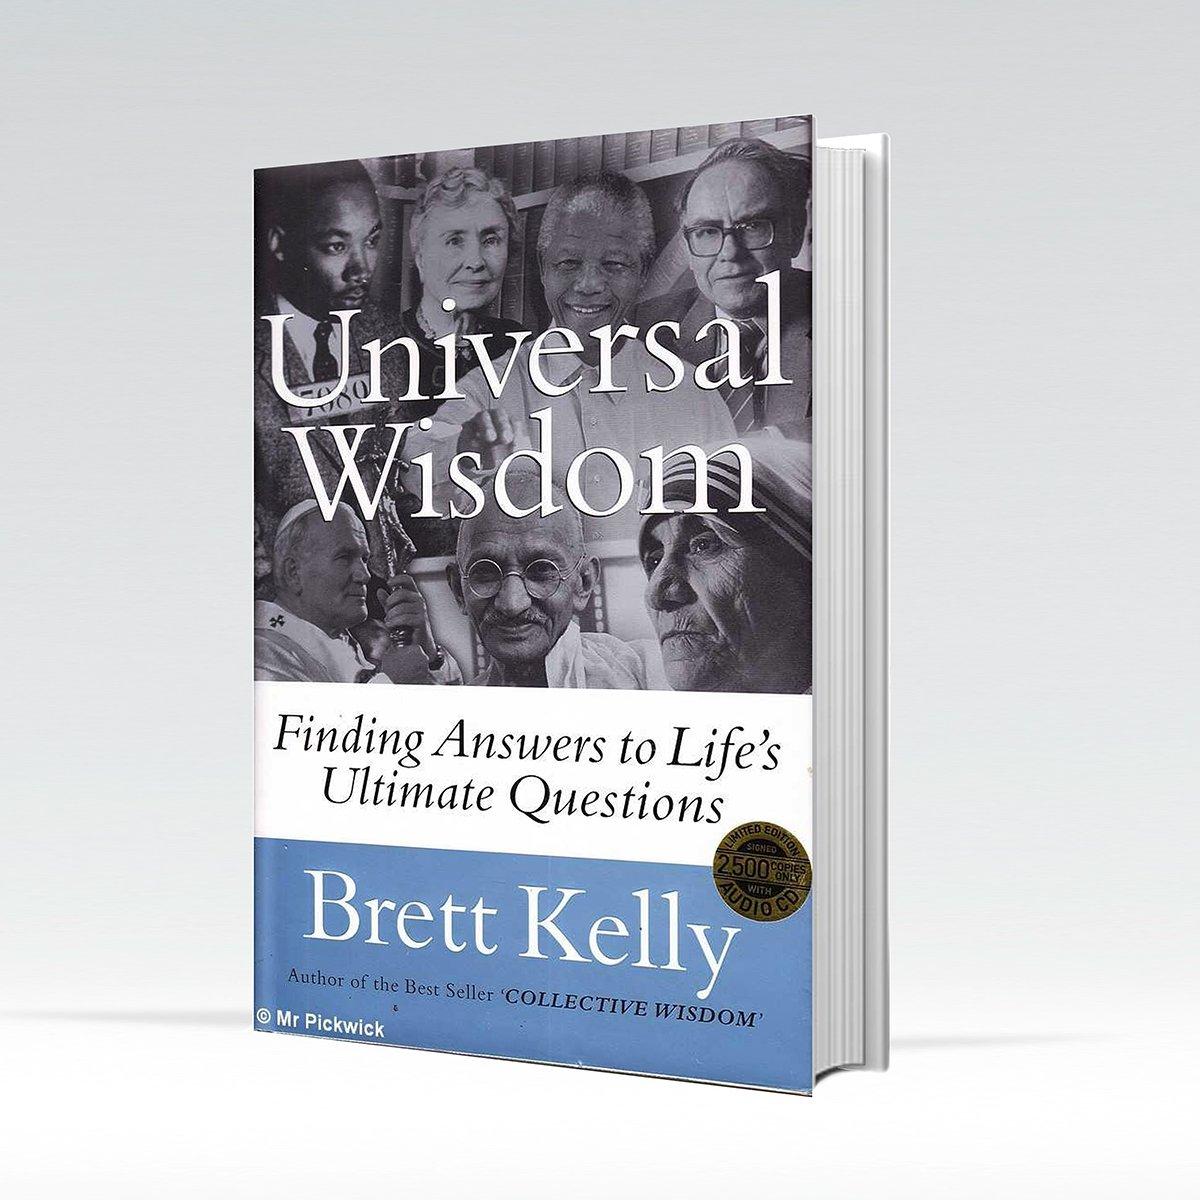 brett-kelly-universal-wisdom